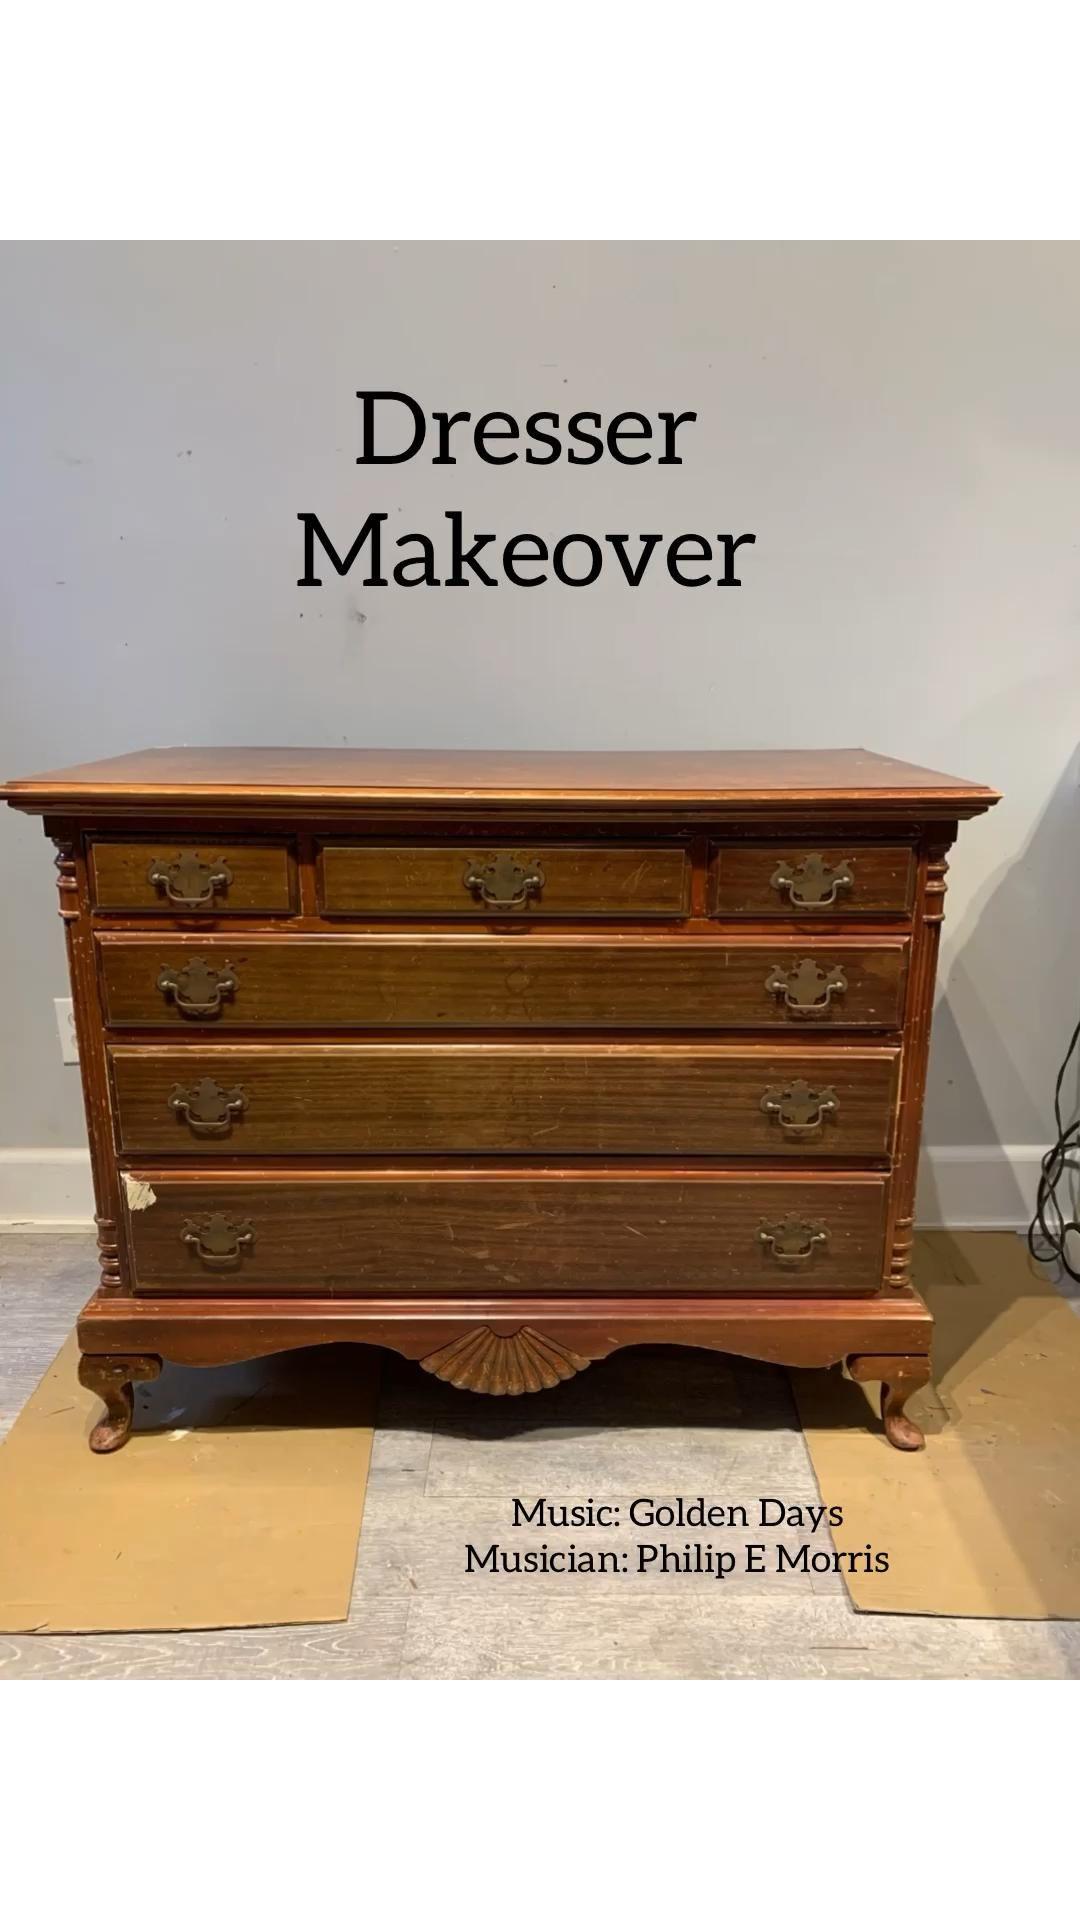 Vintage Dresser Makeover using Shackteau Interiors Milk Paint